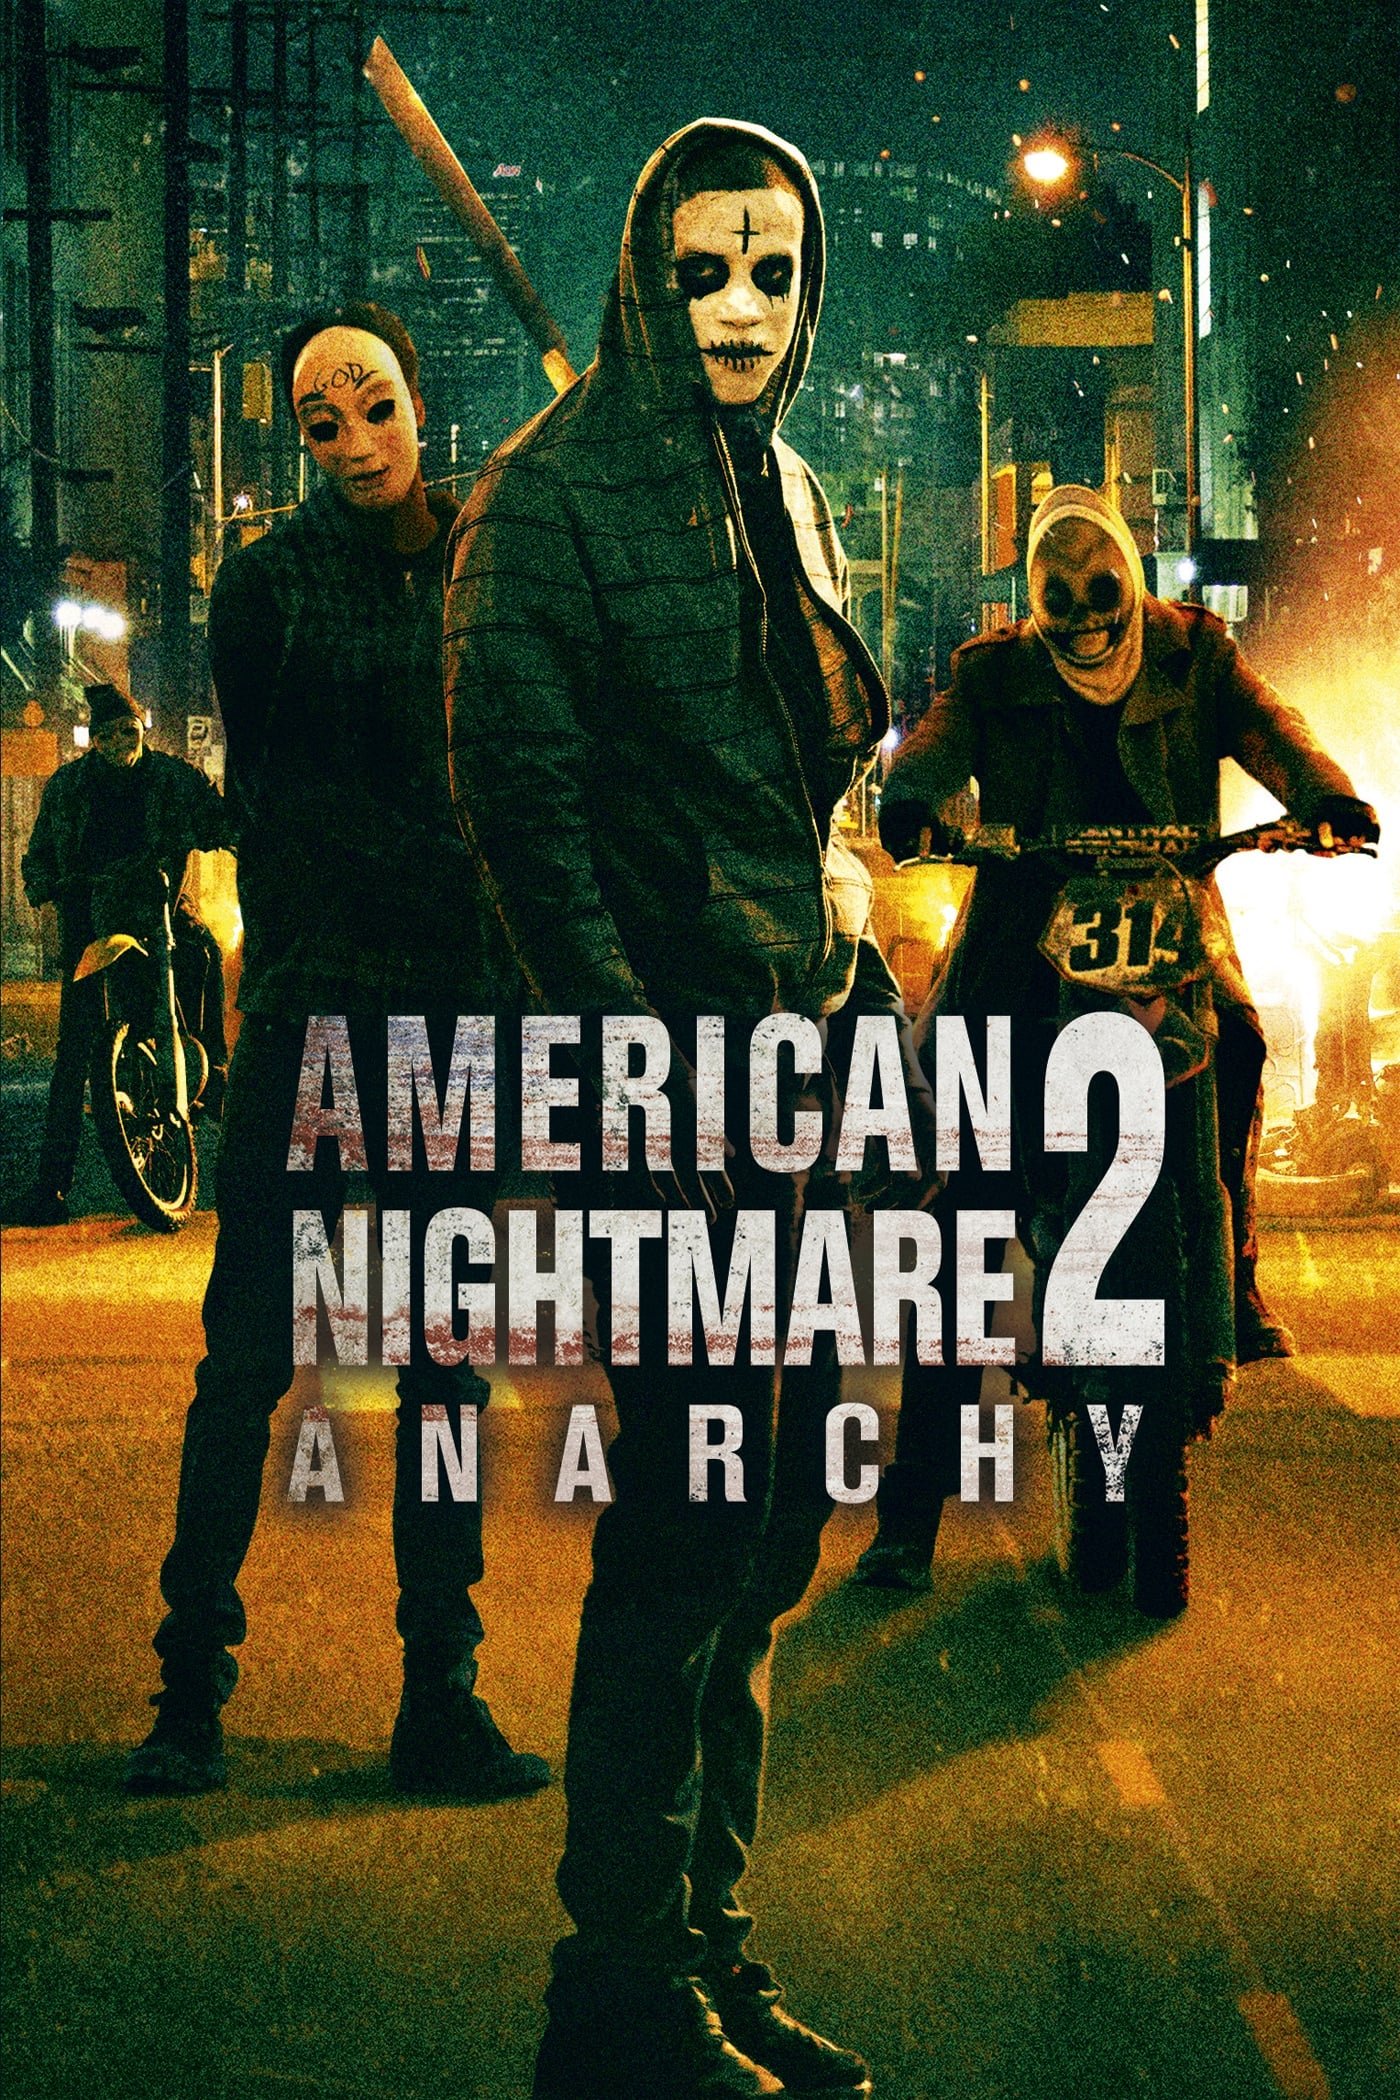 American-Nightmare-2-La-Purge-Anarchie-The-Purge-Anarchy-201